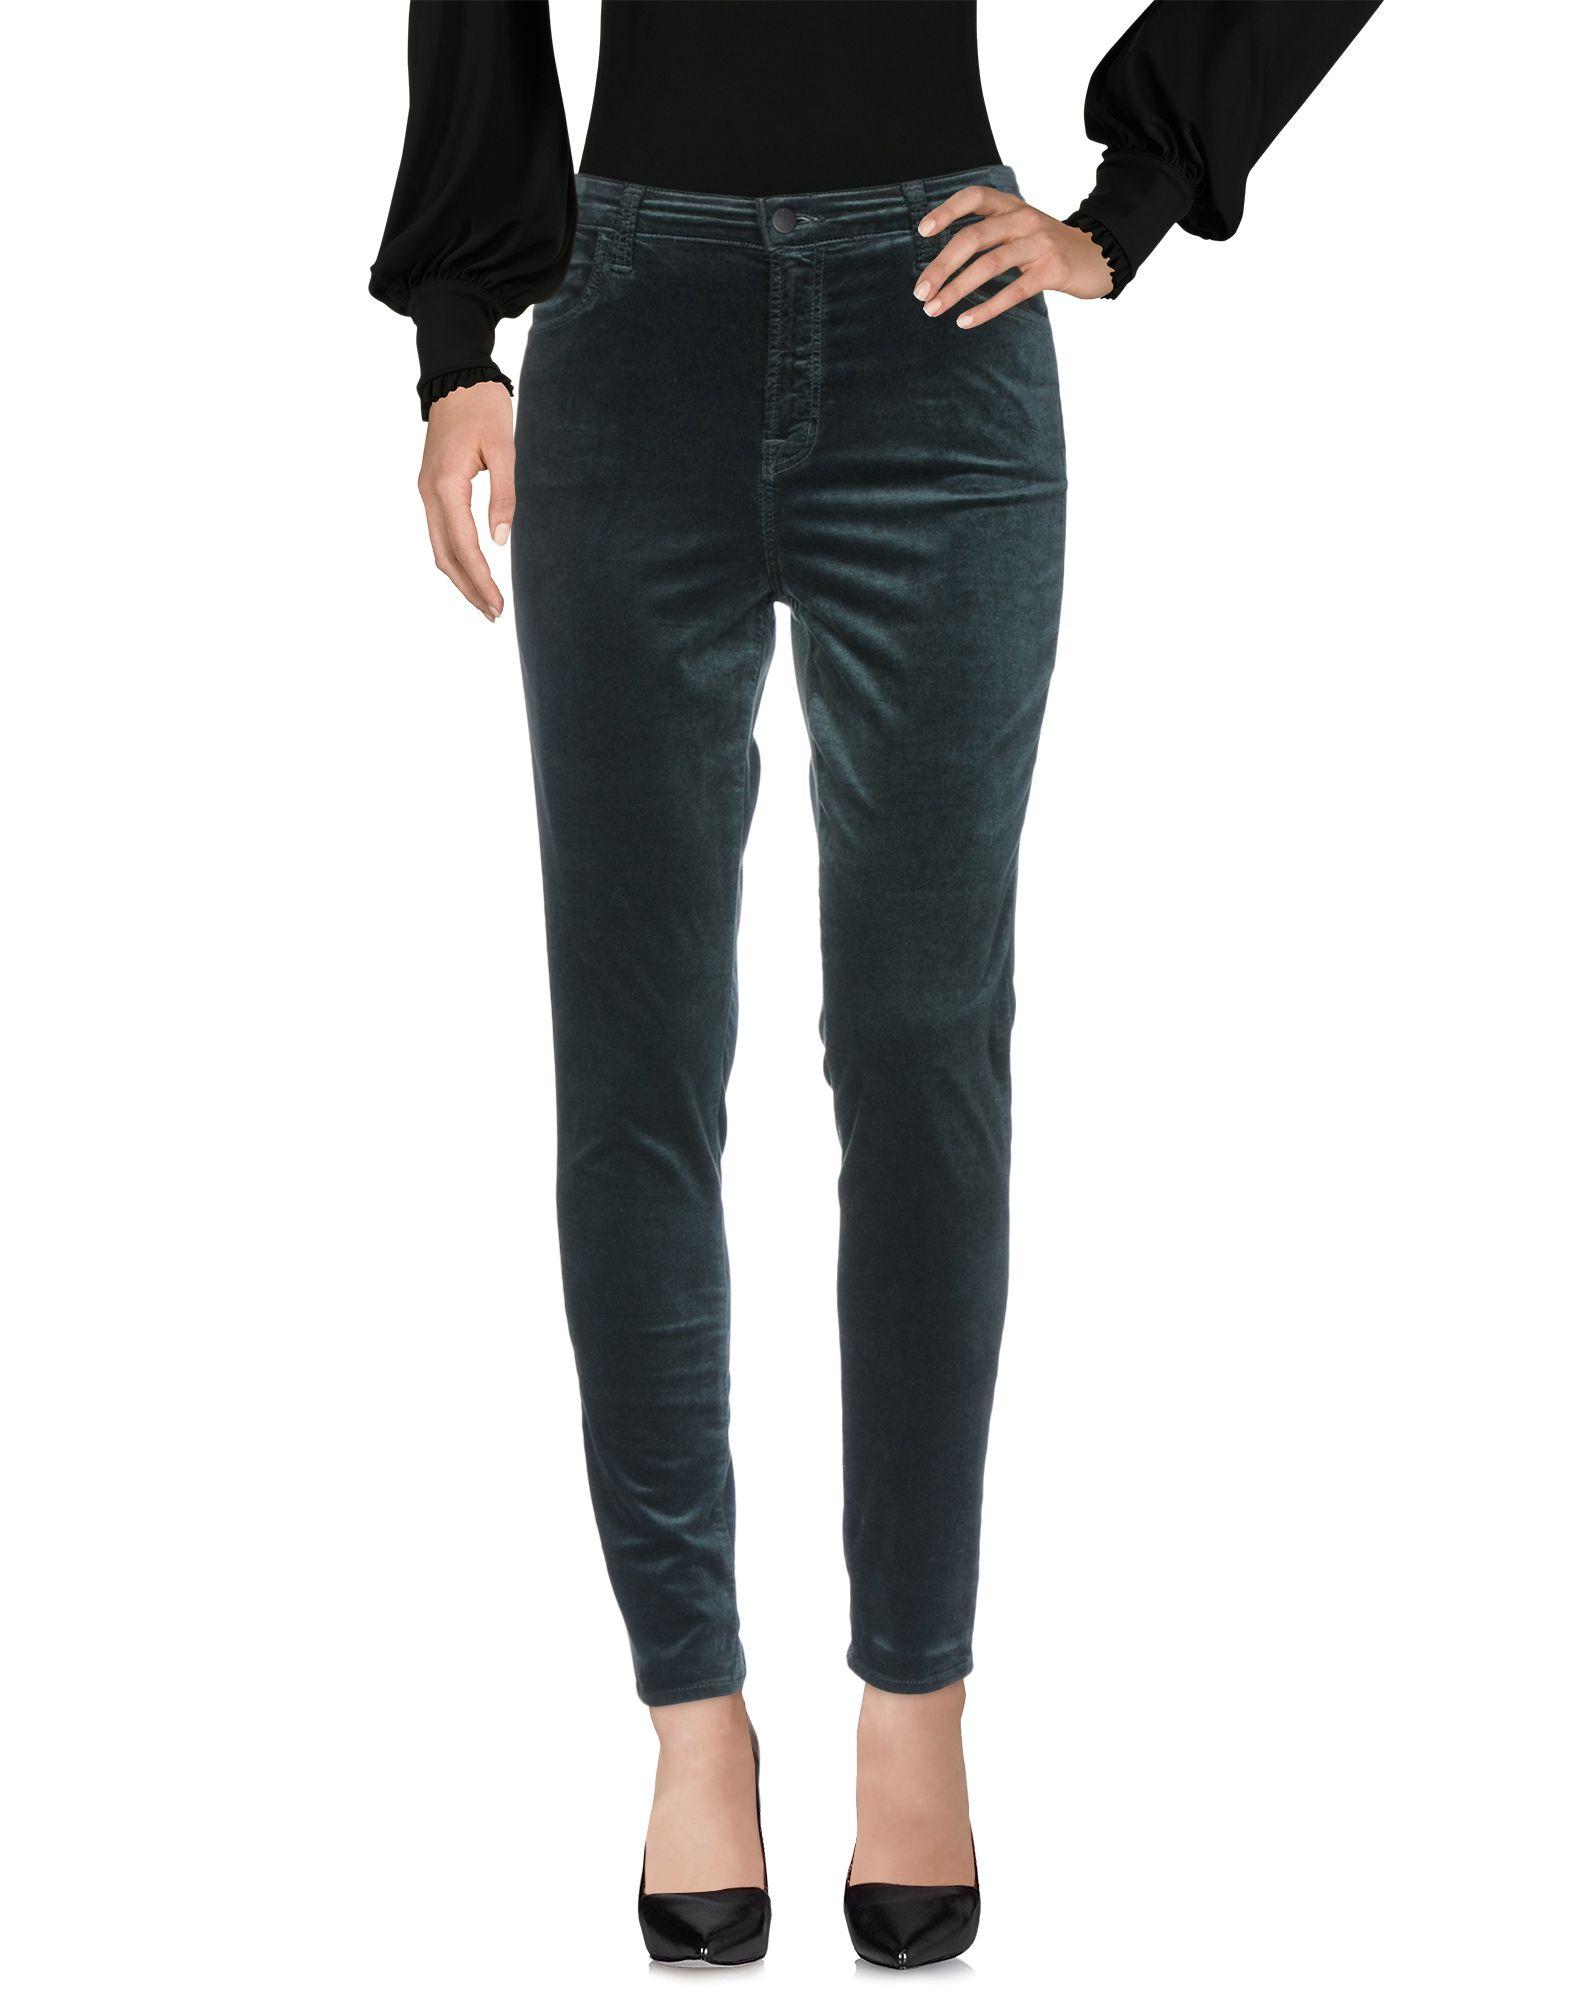 Фото - J BRAND Повседневные брюки high waist ripped skinny pants